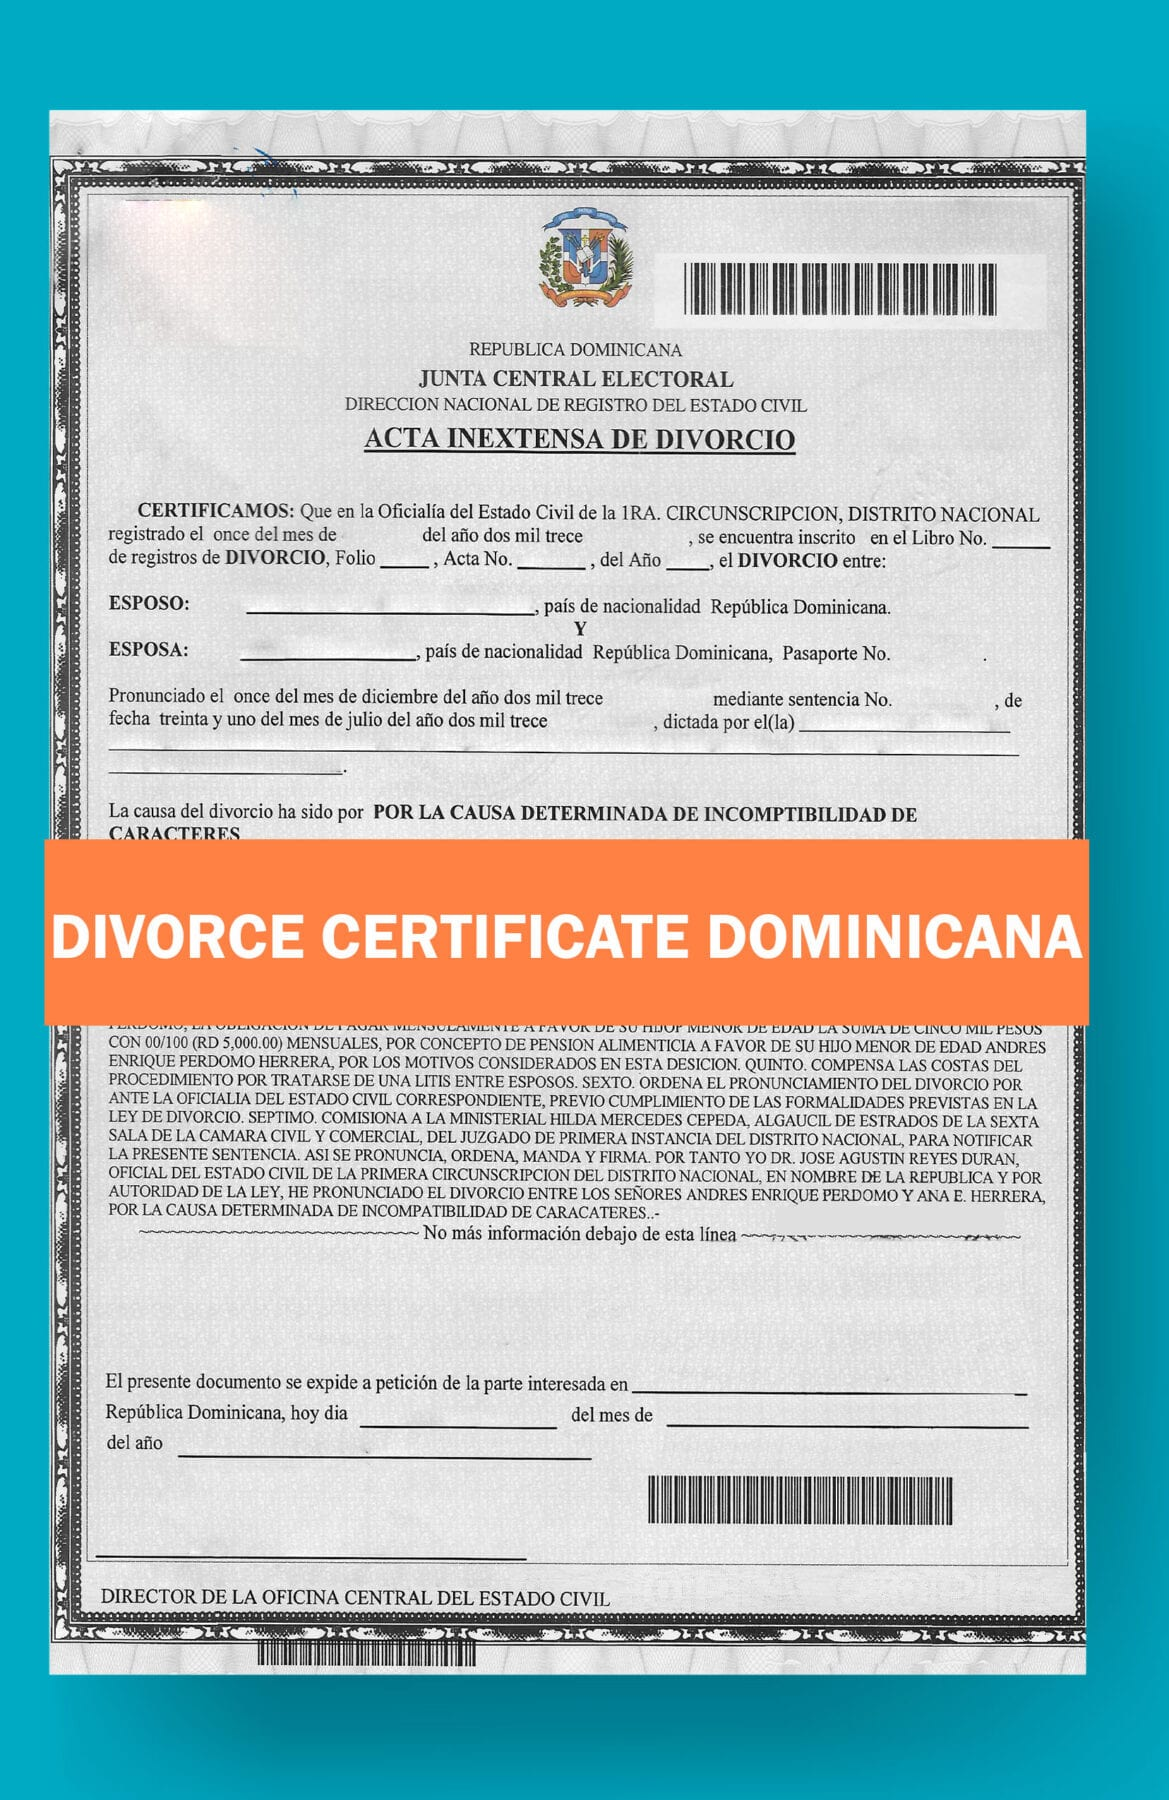 DIVORCE-CERTIFICATE-TEMPLATE-DOMINICANA